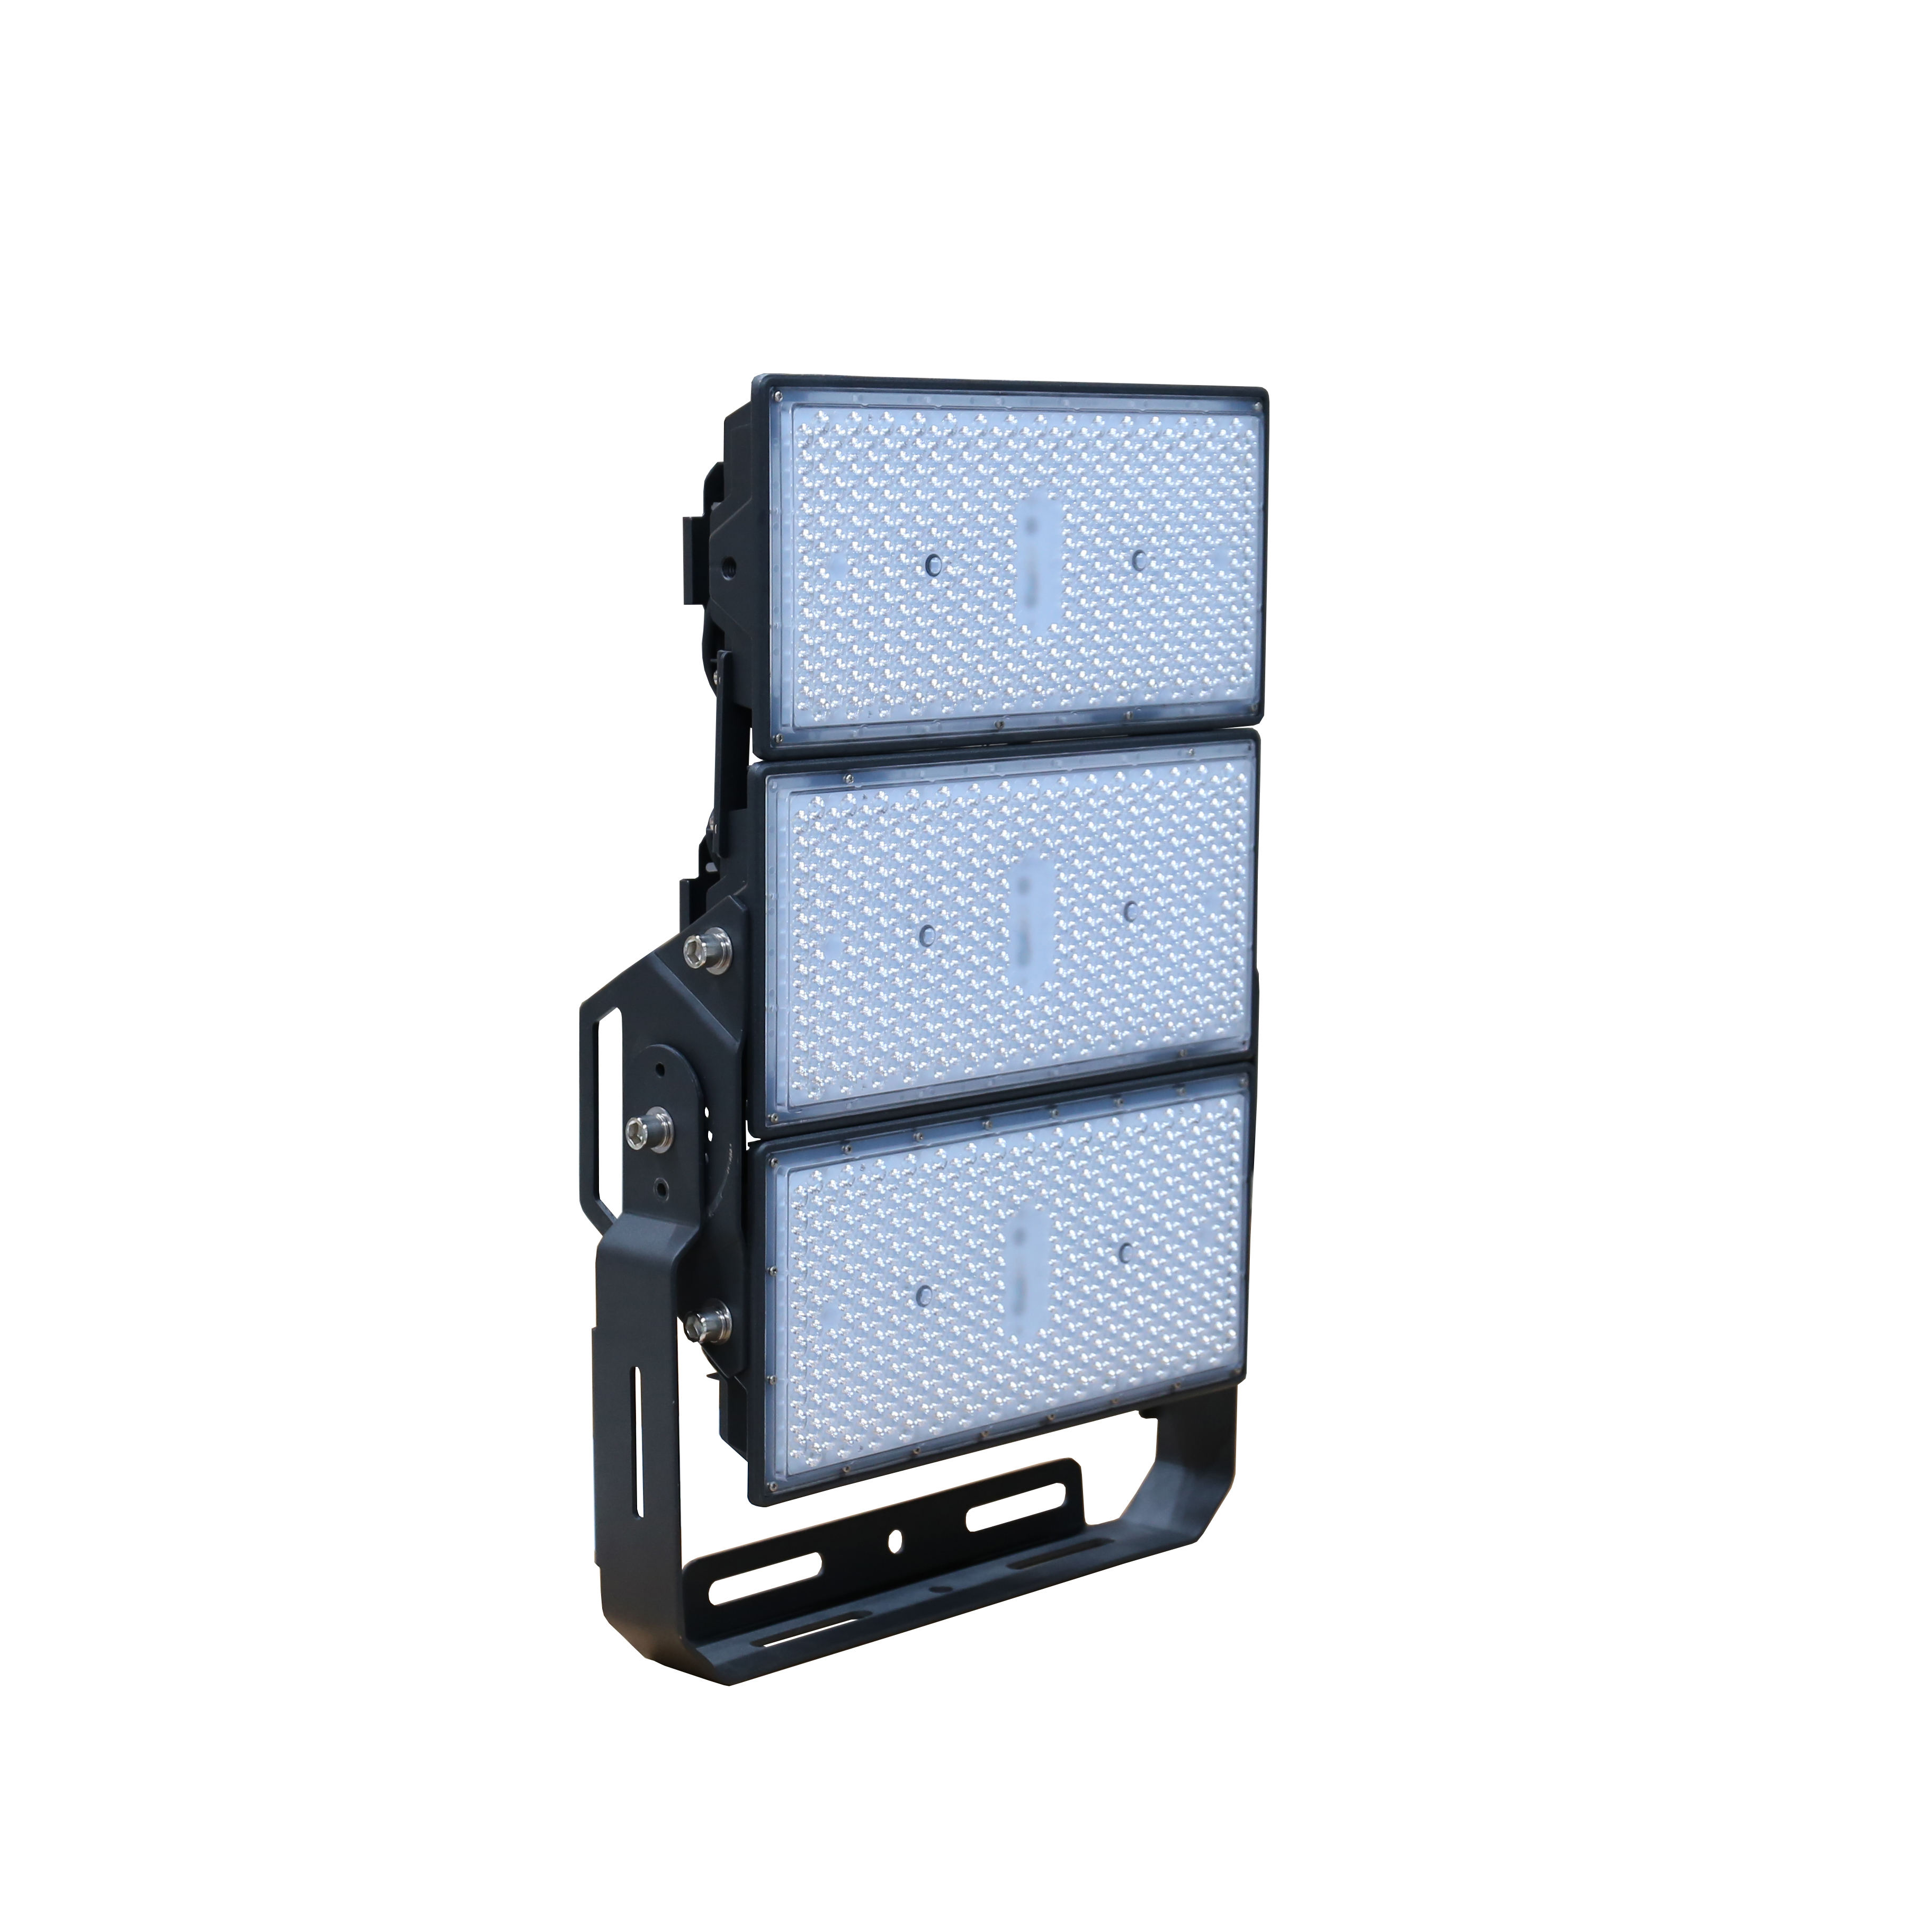 ETL DLC listed outdoor 96000 lumen stadium 200w 400w 600w reflector flood led light outdoor IP66 5 years warranty